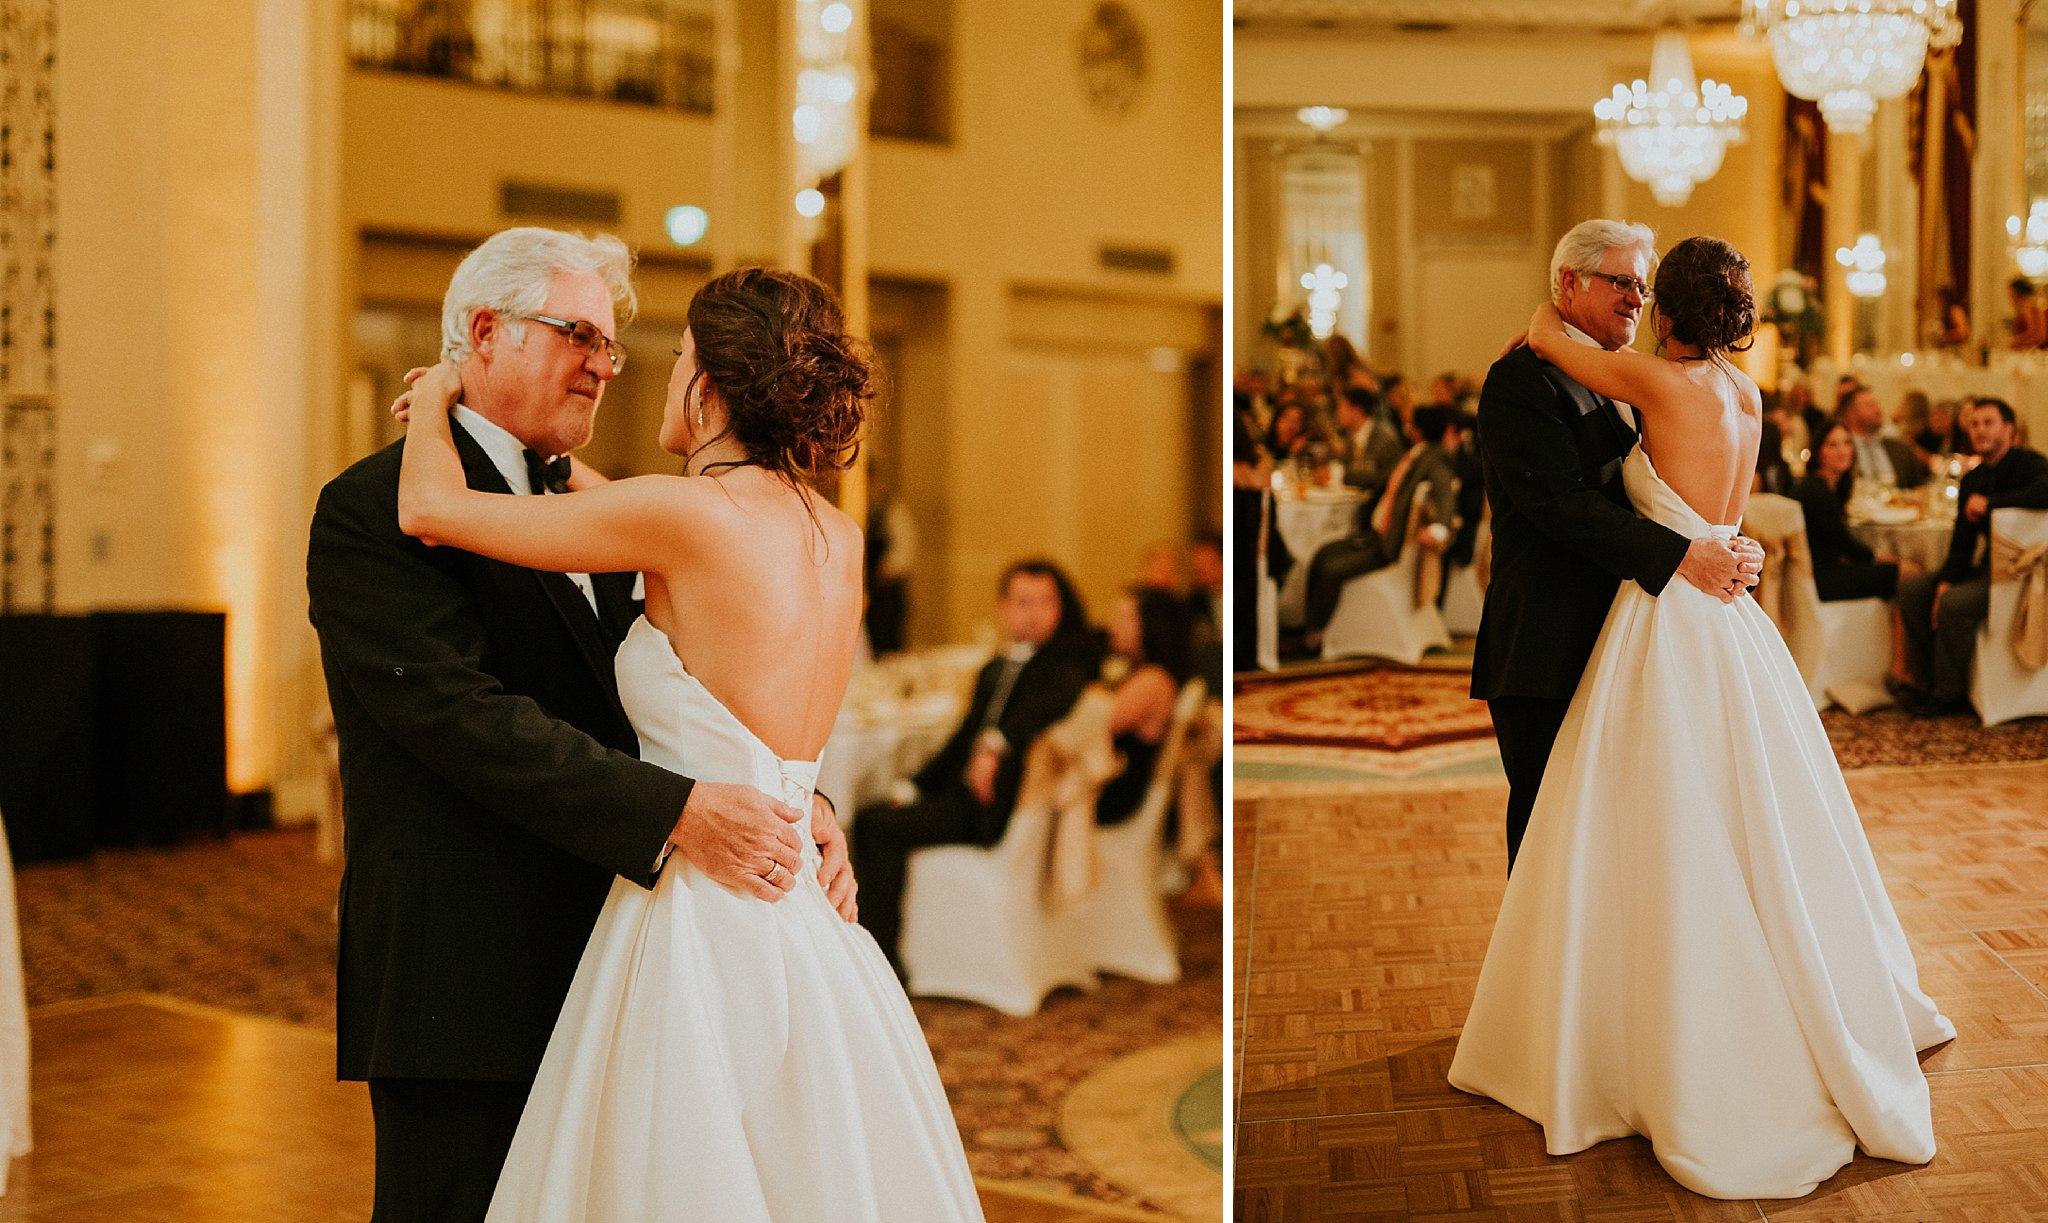 Matt-Lauren_St-Marys_Hilton-City-Center-Milwaukee-Wedding_liller-photo_0070.jpg